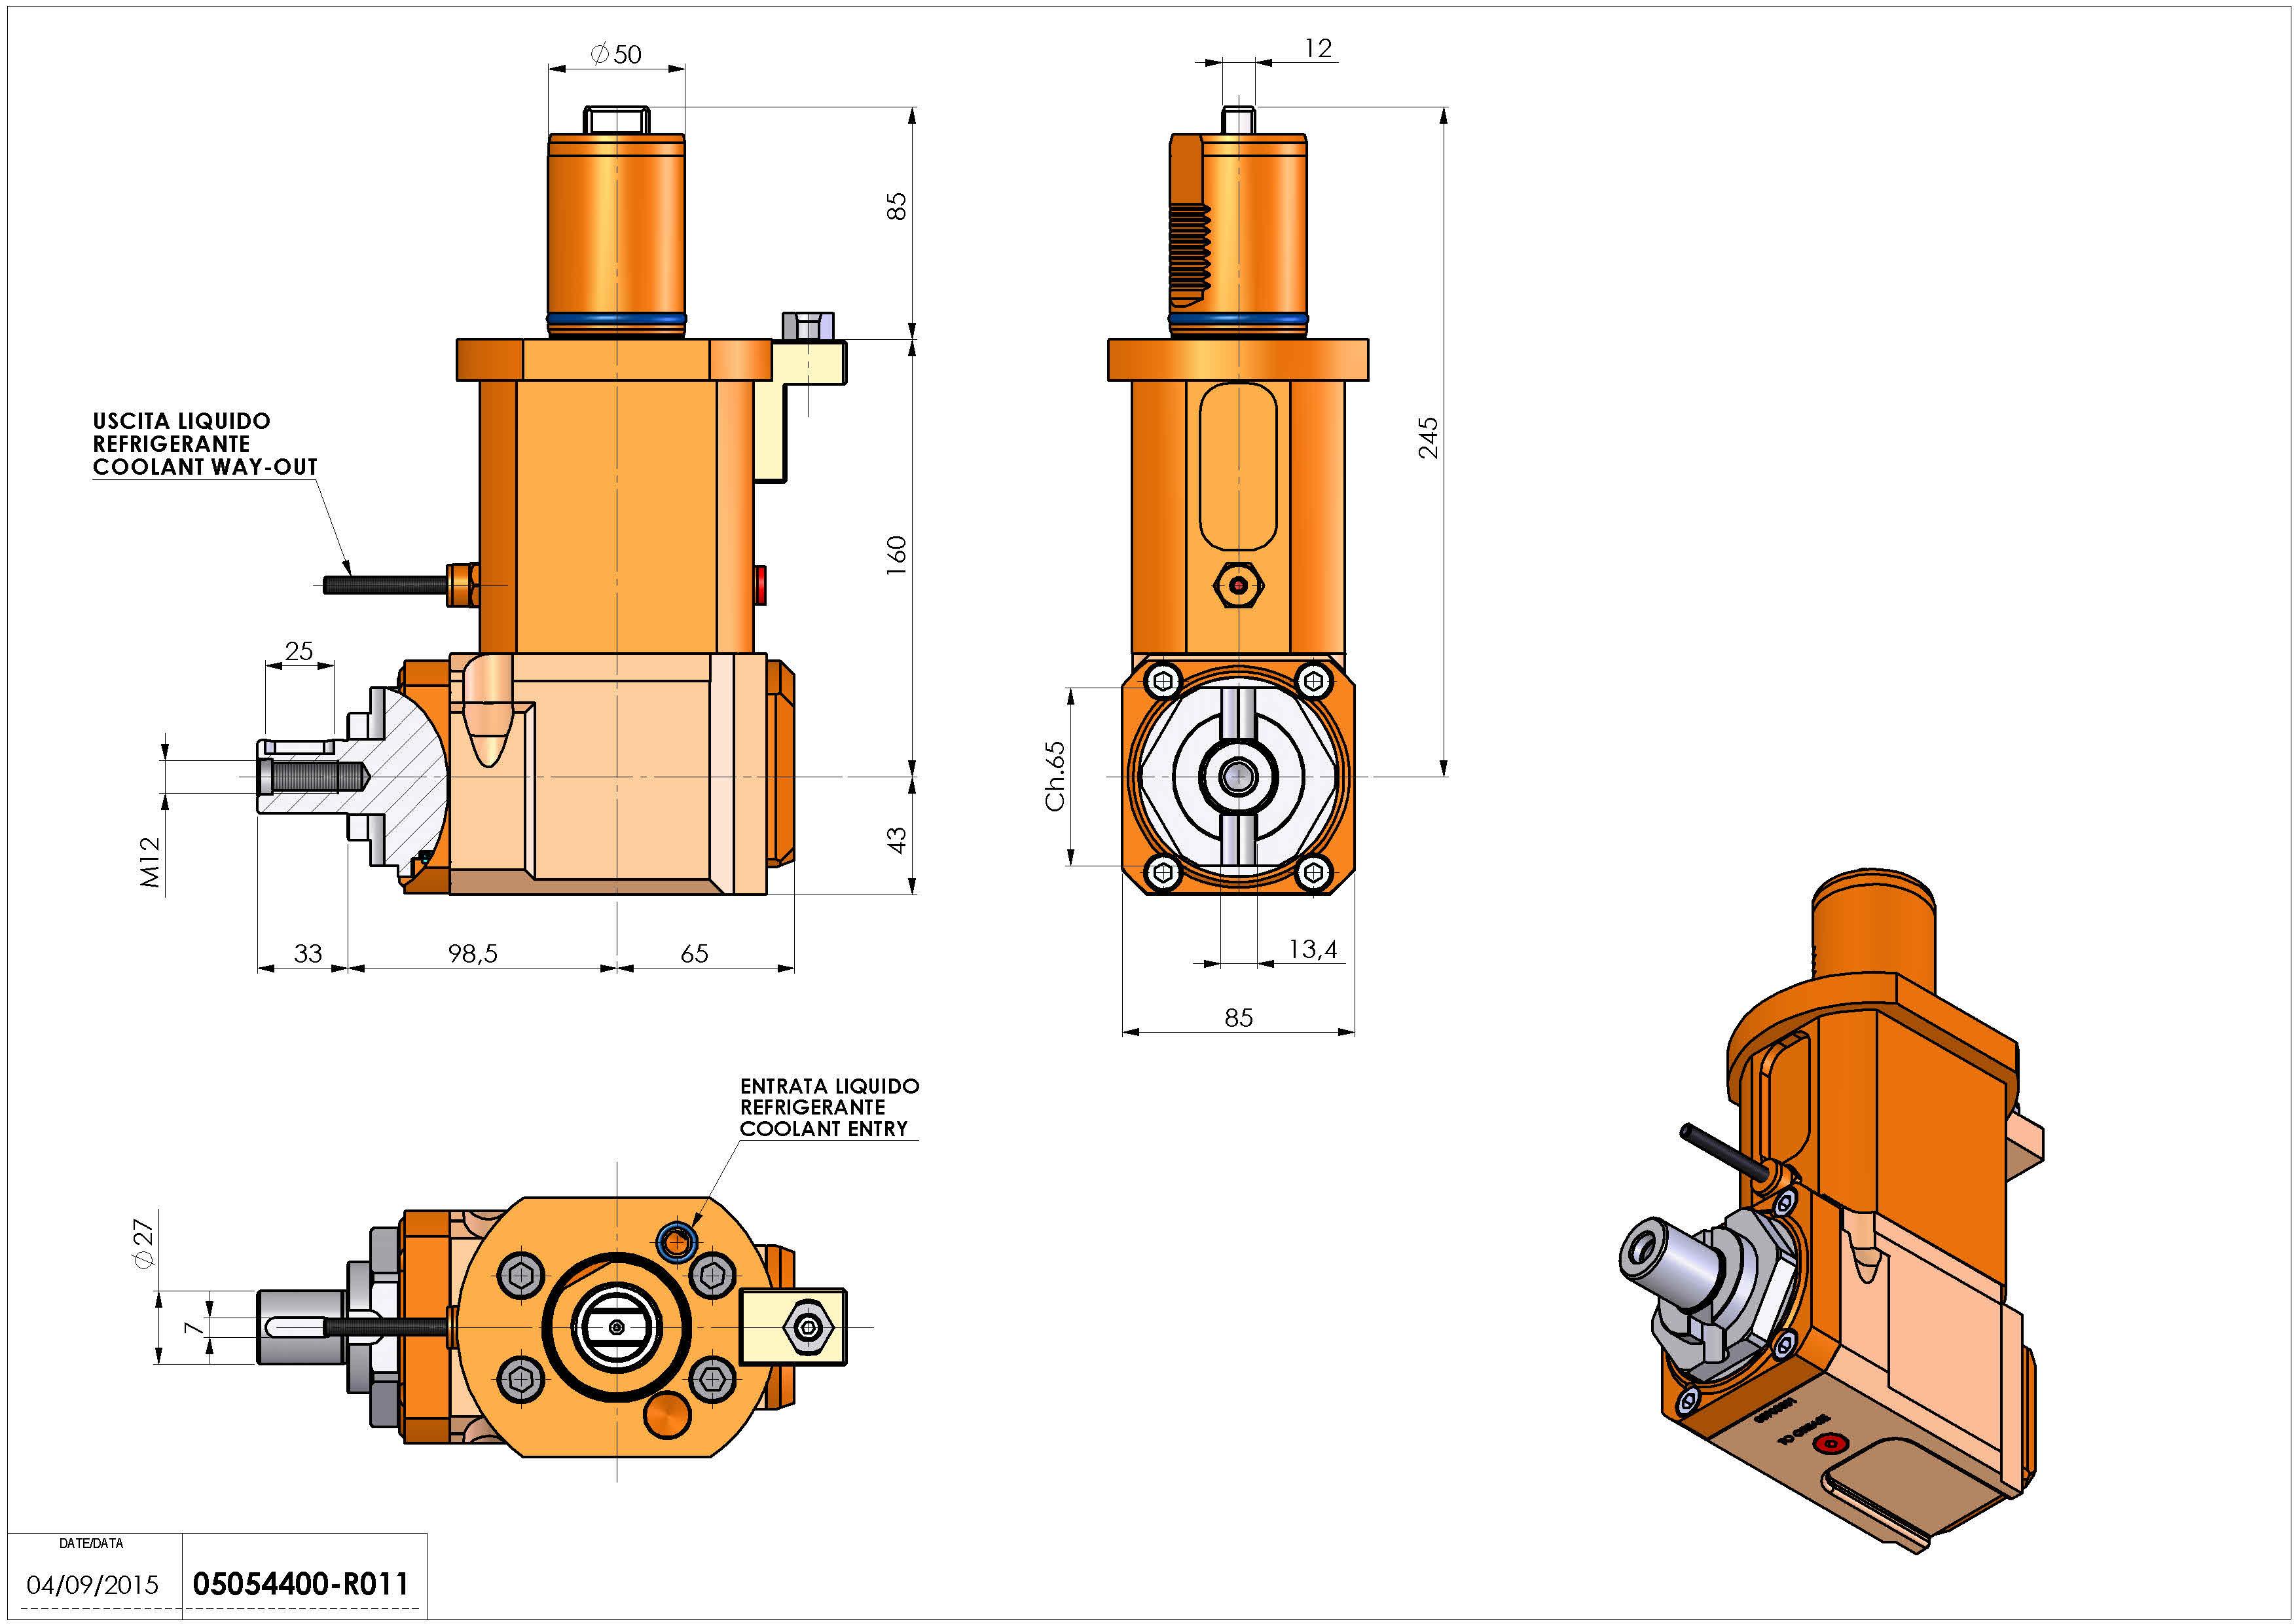 Technical image - LT-A VDI50 DIN138-27 L H160 MZ.